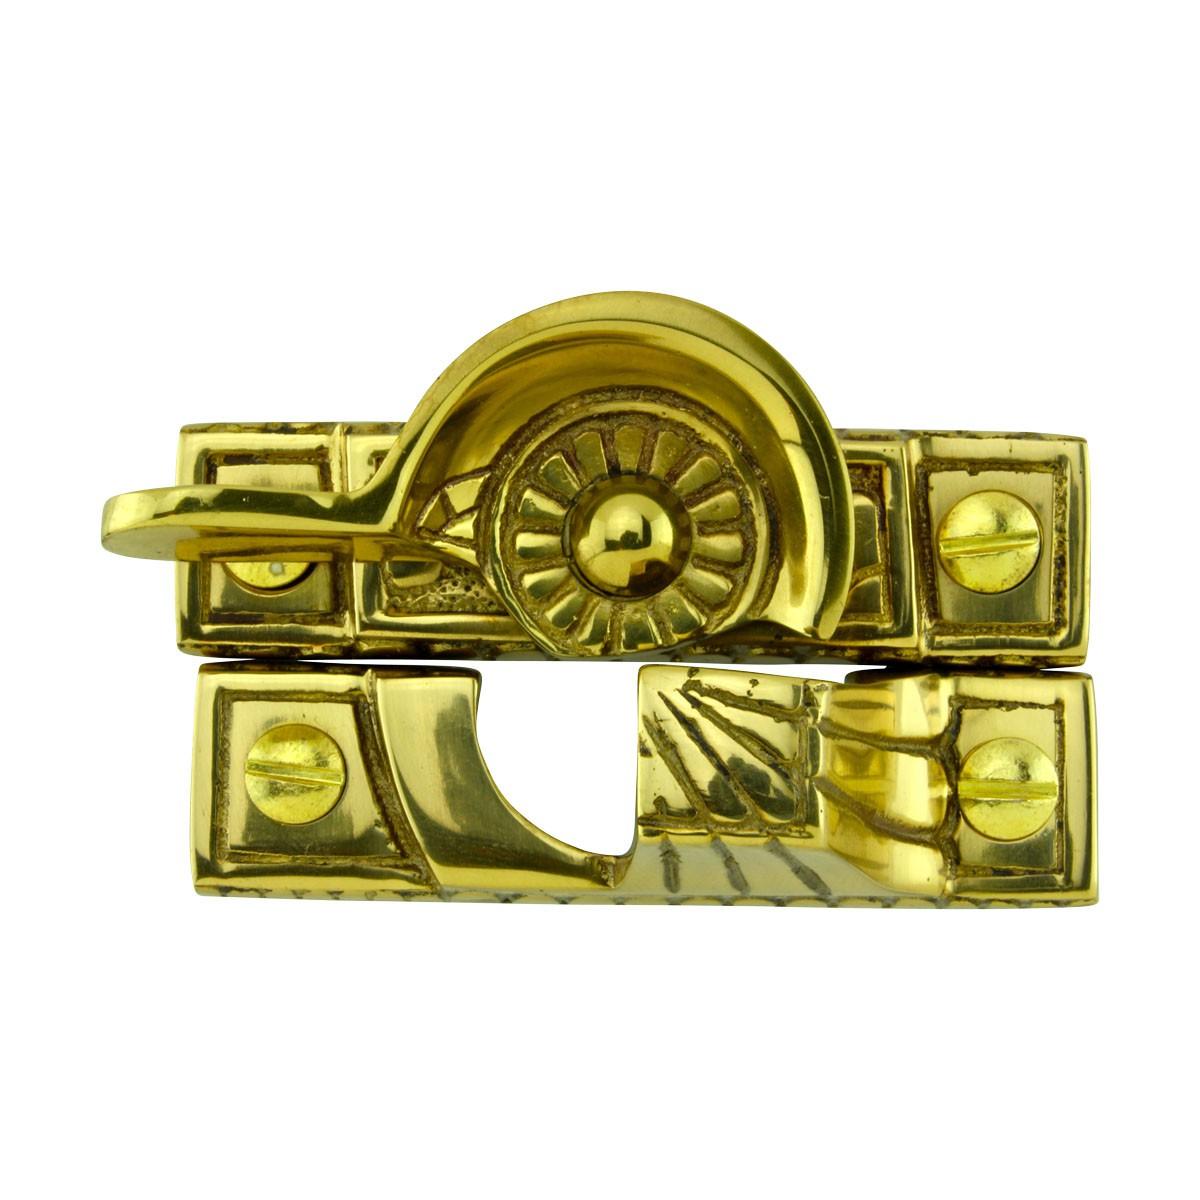 Ornate Window Sash Lock Bright Solid Brass Solid Brass Sash Lock Ornate Sash Lift Bright  Sash Window Locks